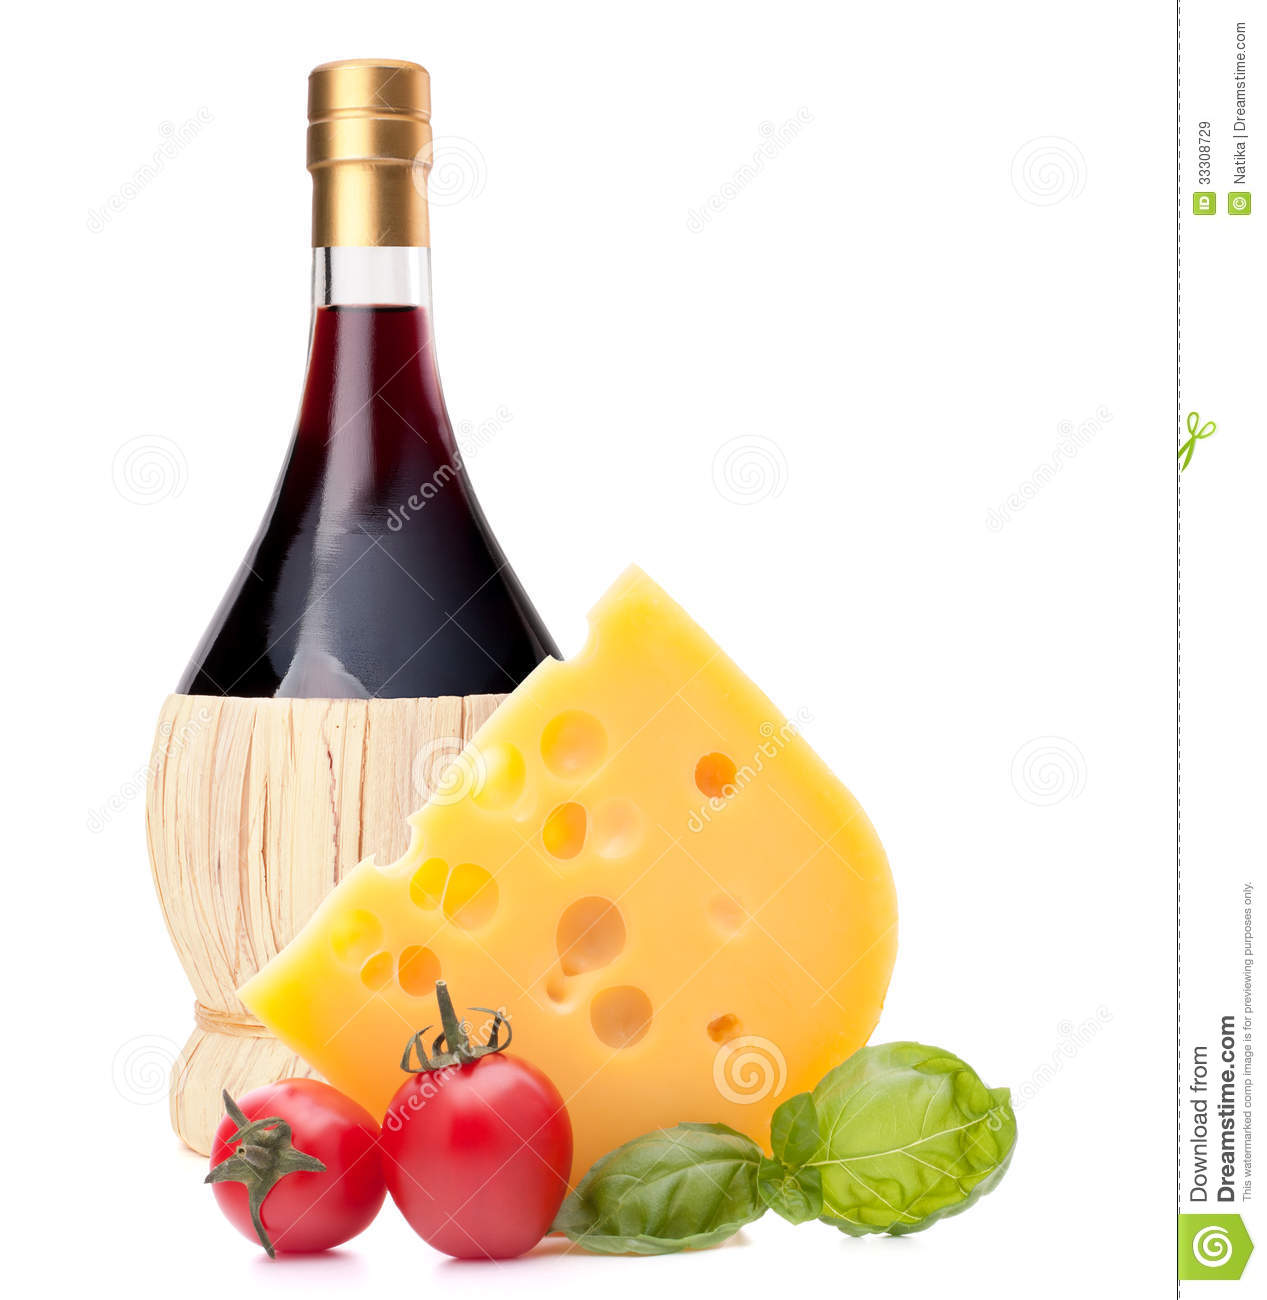 Italian wine clipart clipart suggest for Cuisine wine